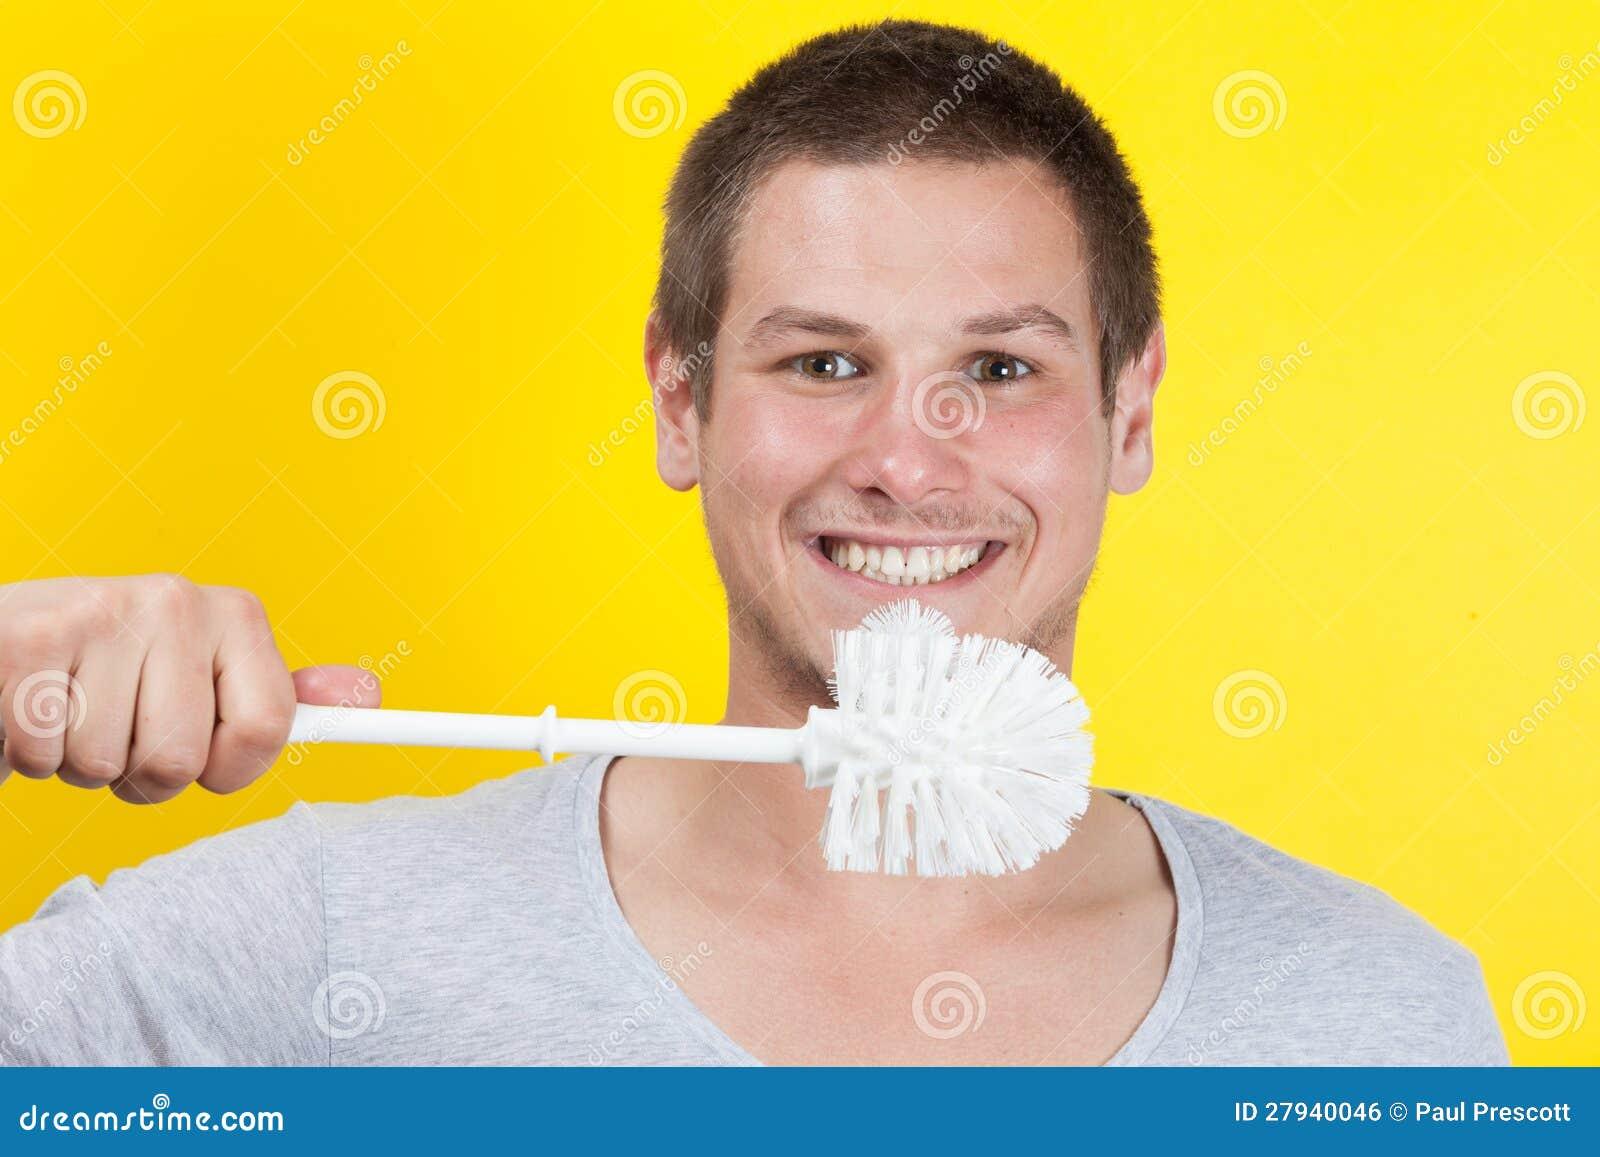 Oral hygiene in toilet 4 8